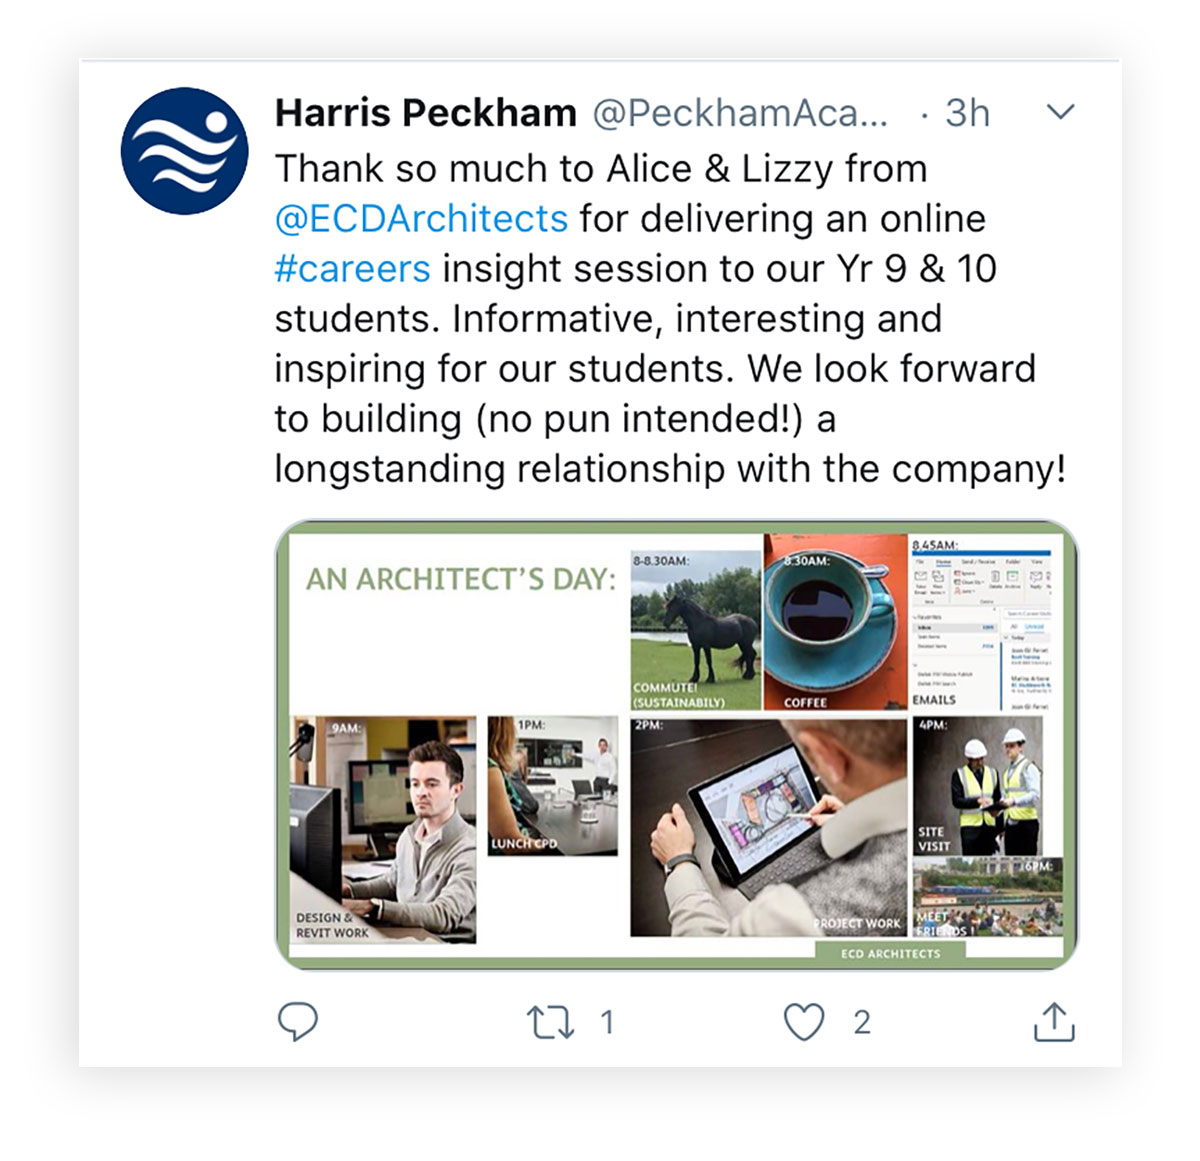 Peckham Academy - architecture insite day via teams